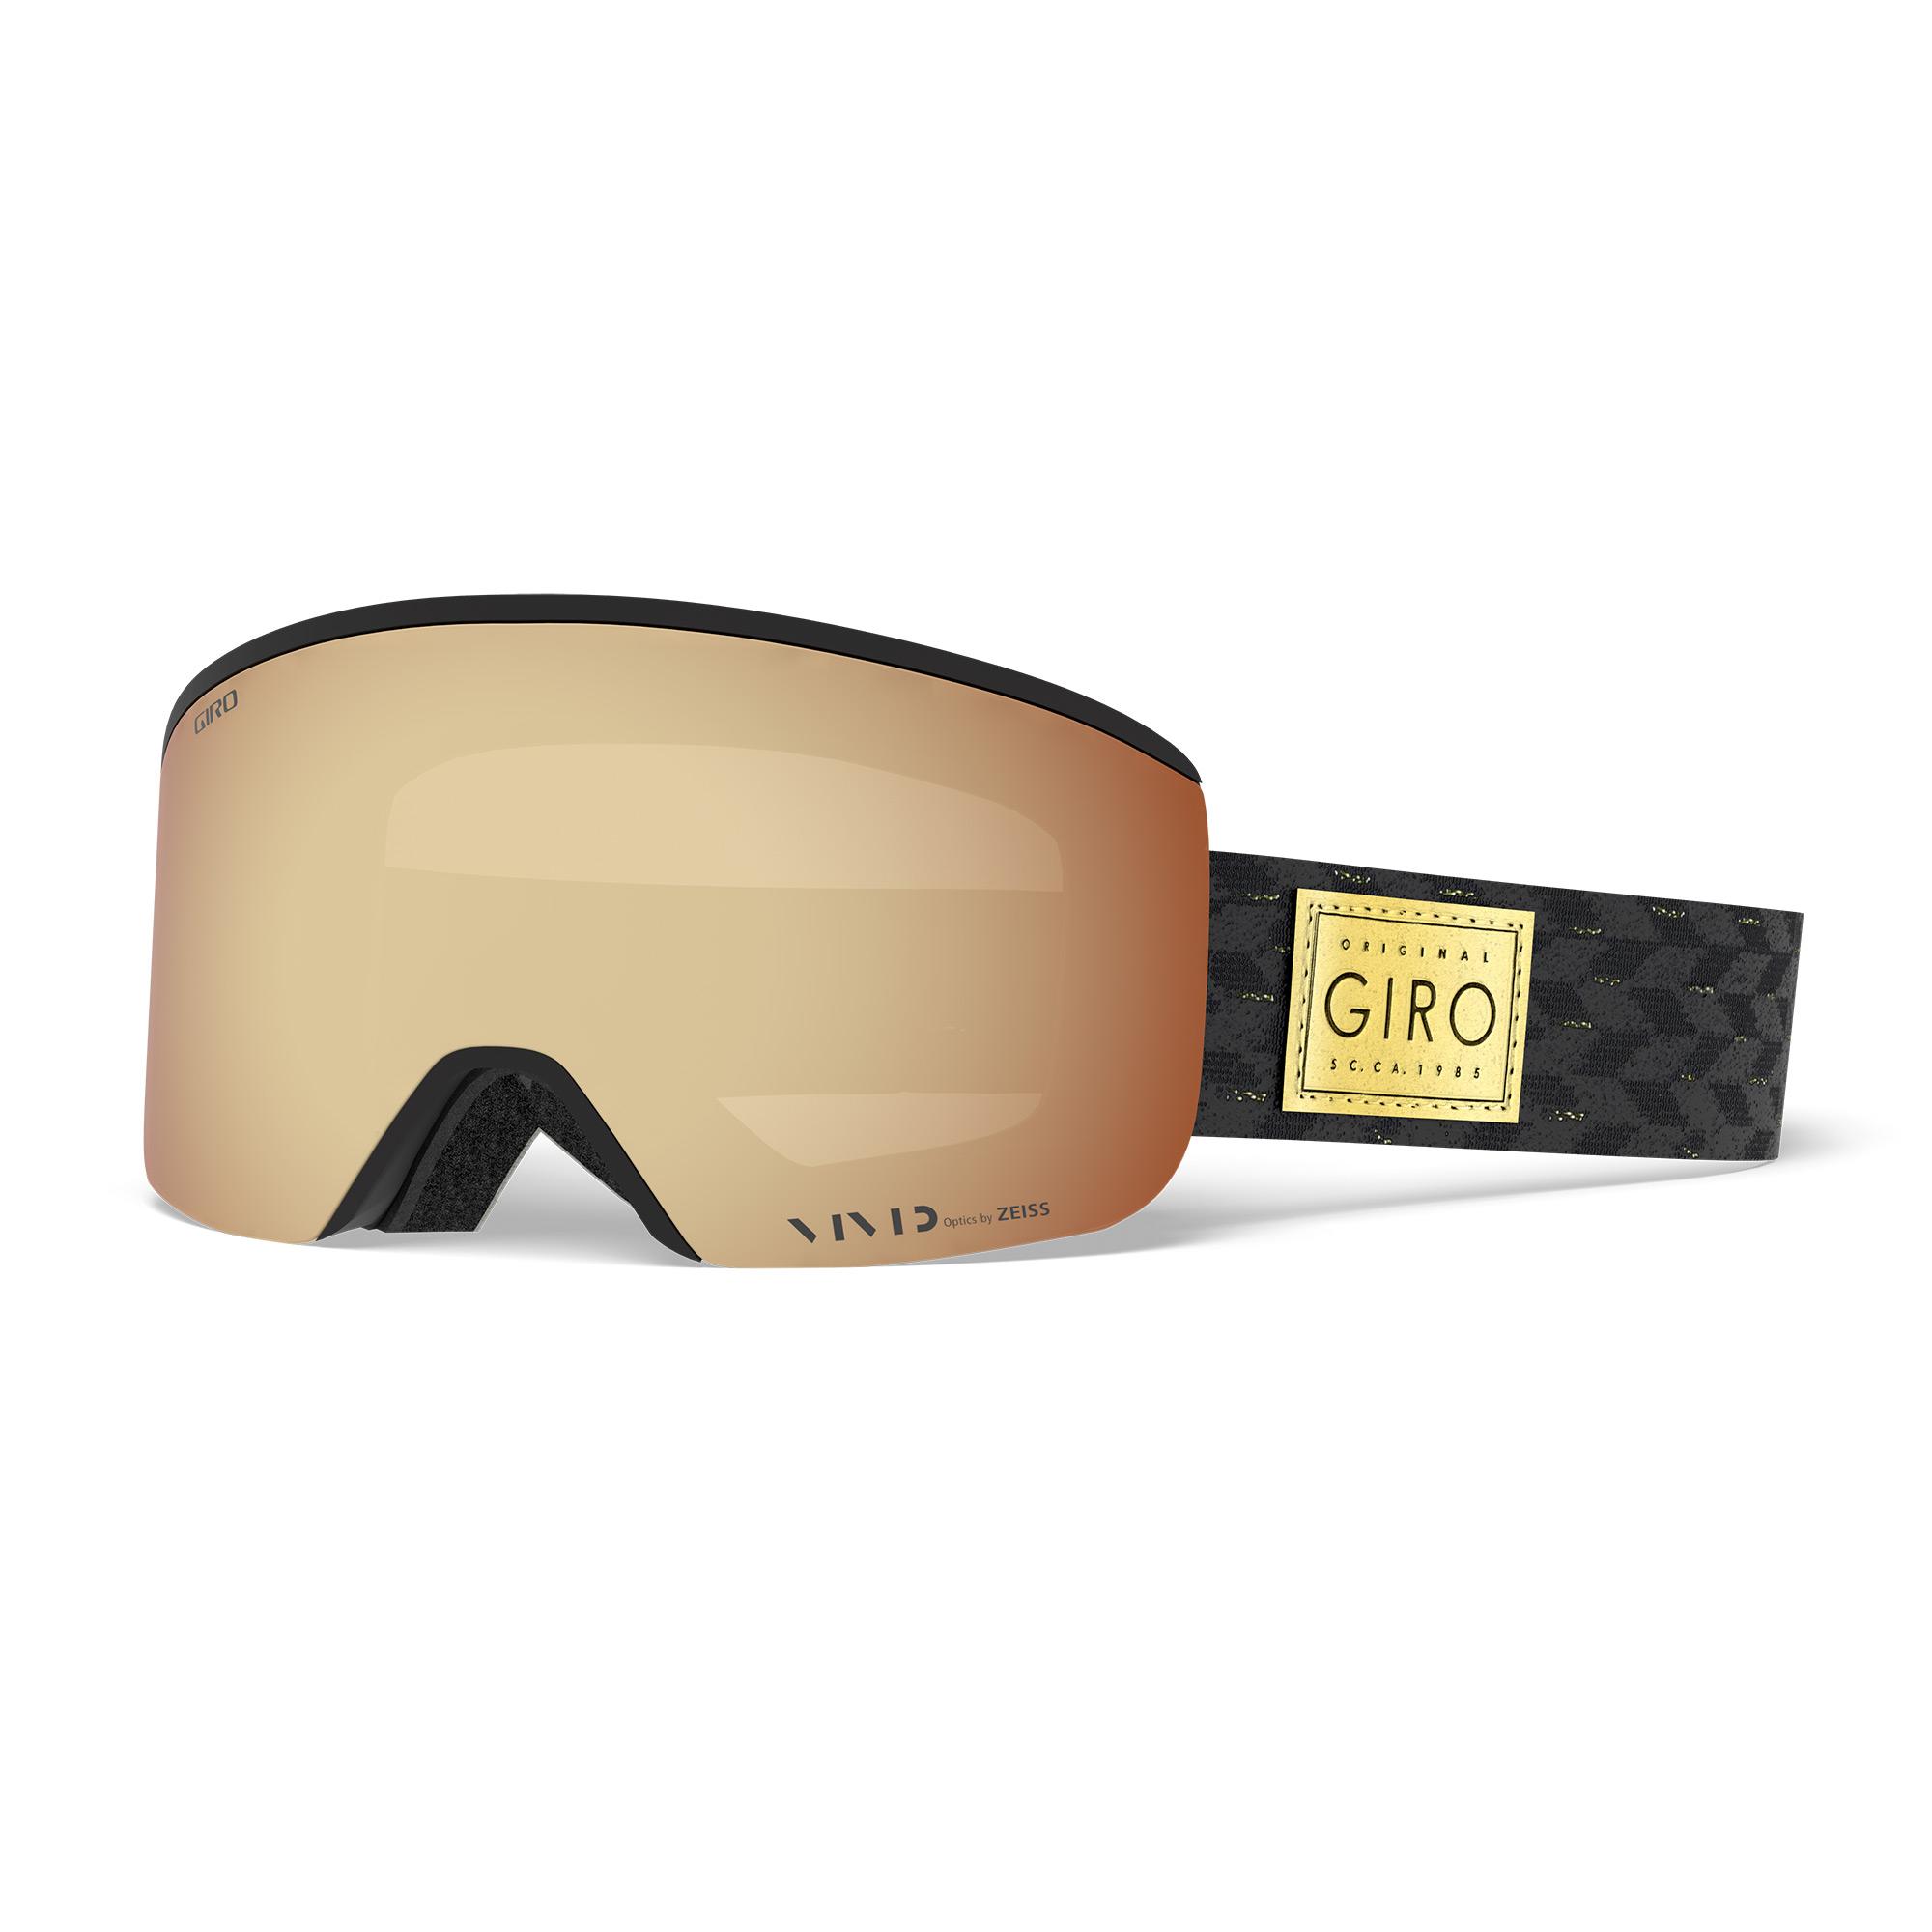 giro-ella-snow-goggle-black-gold-shimmer-vivid-copper-7083002-hero.jpg